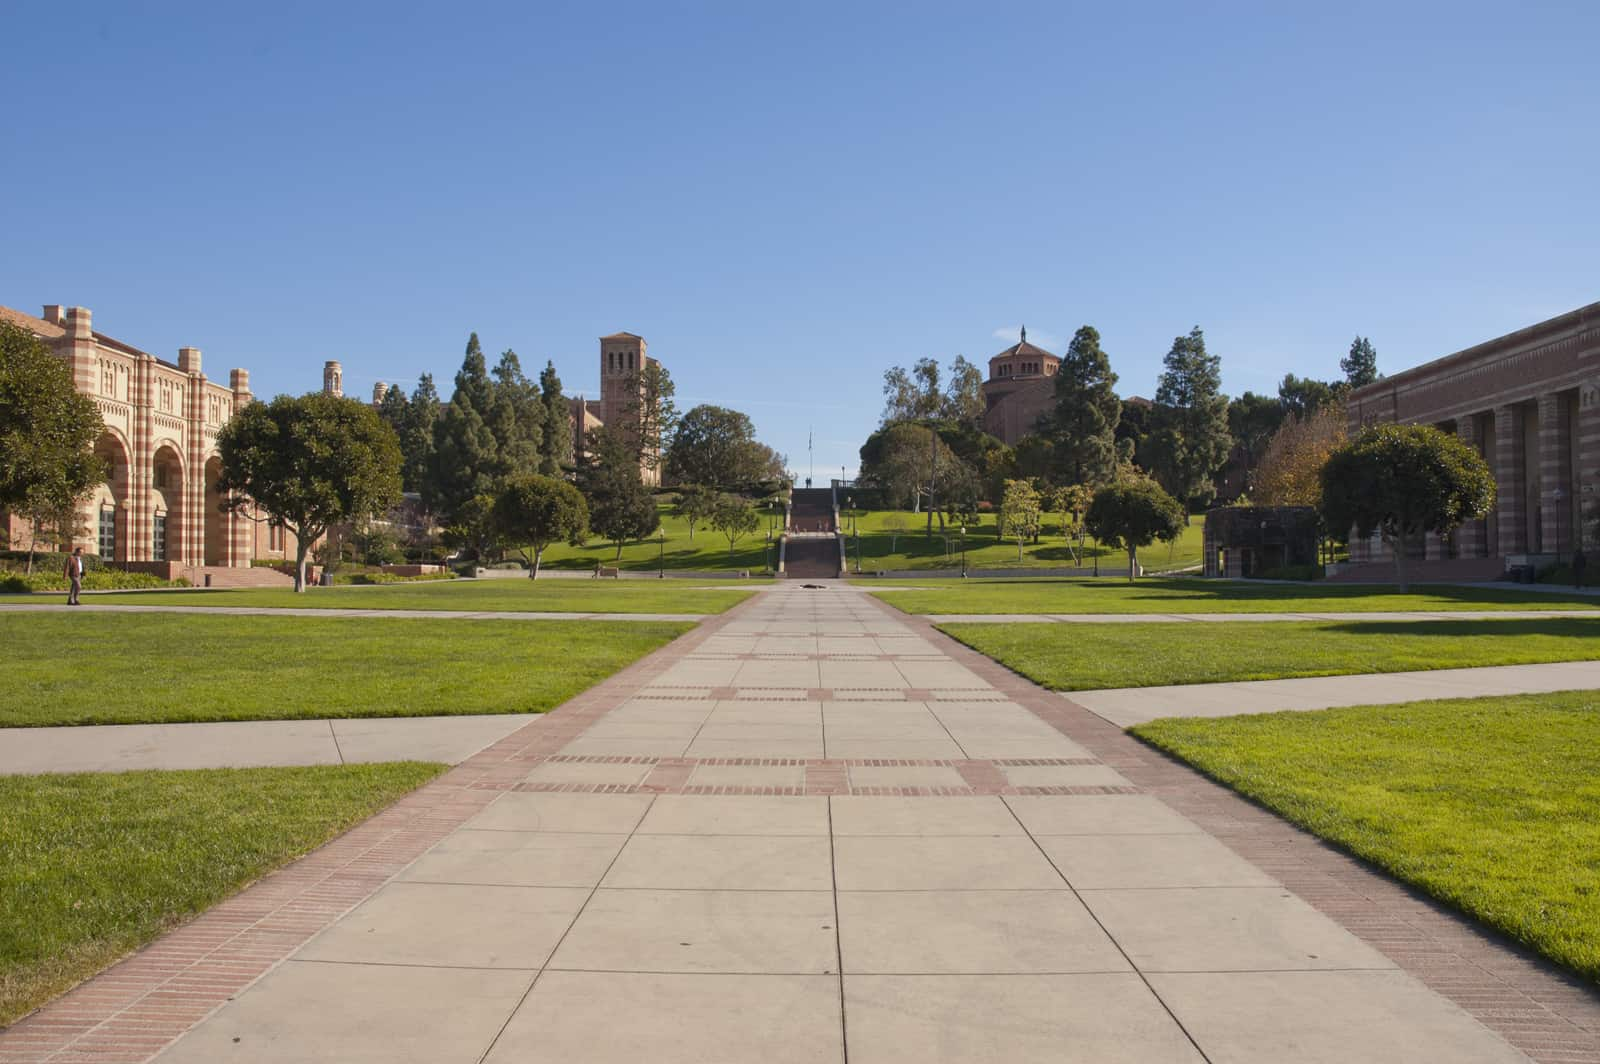 Wilson Plaza